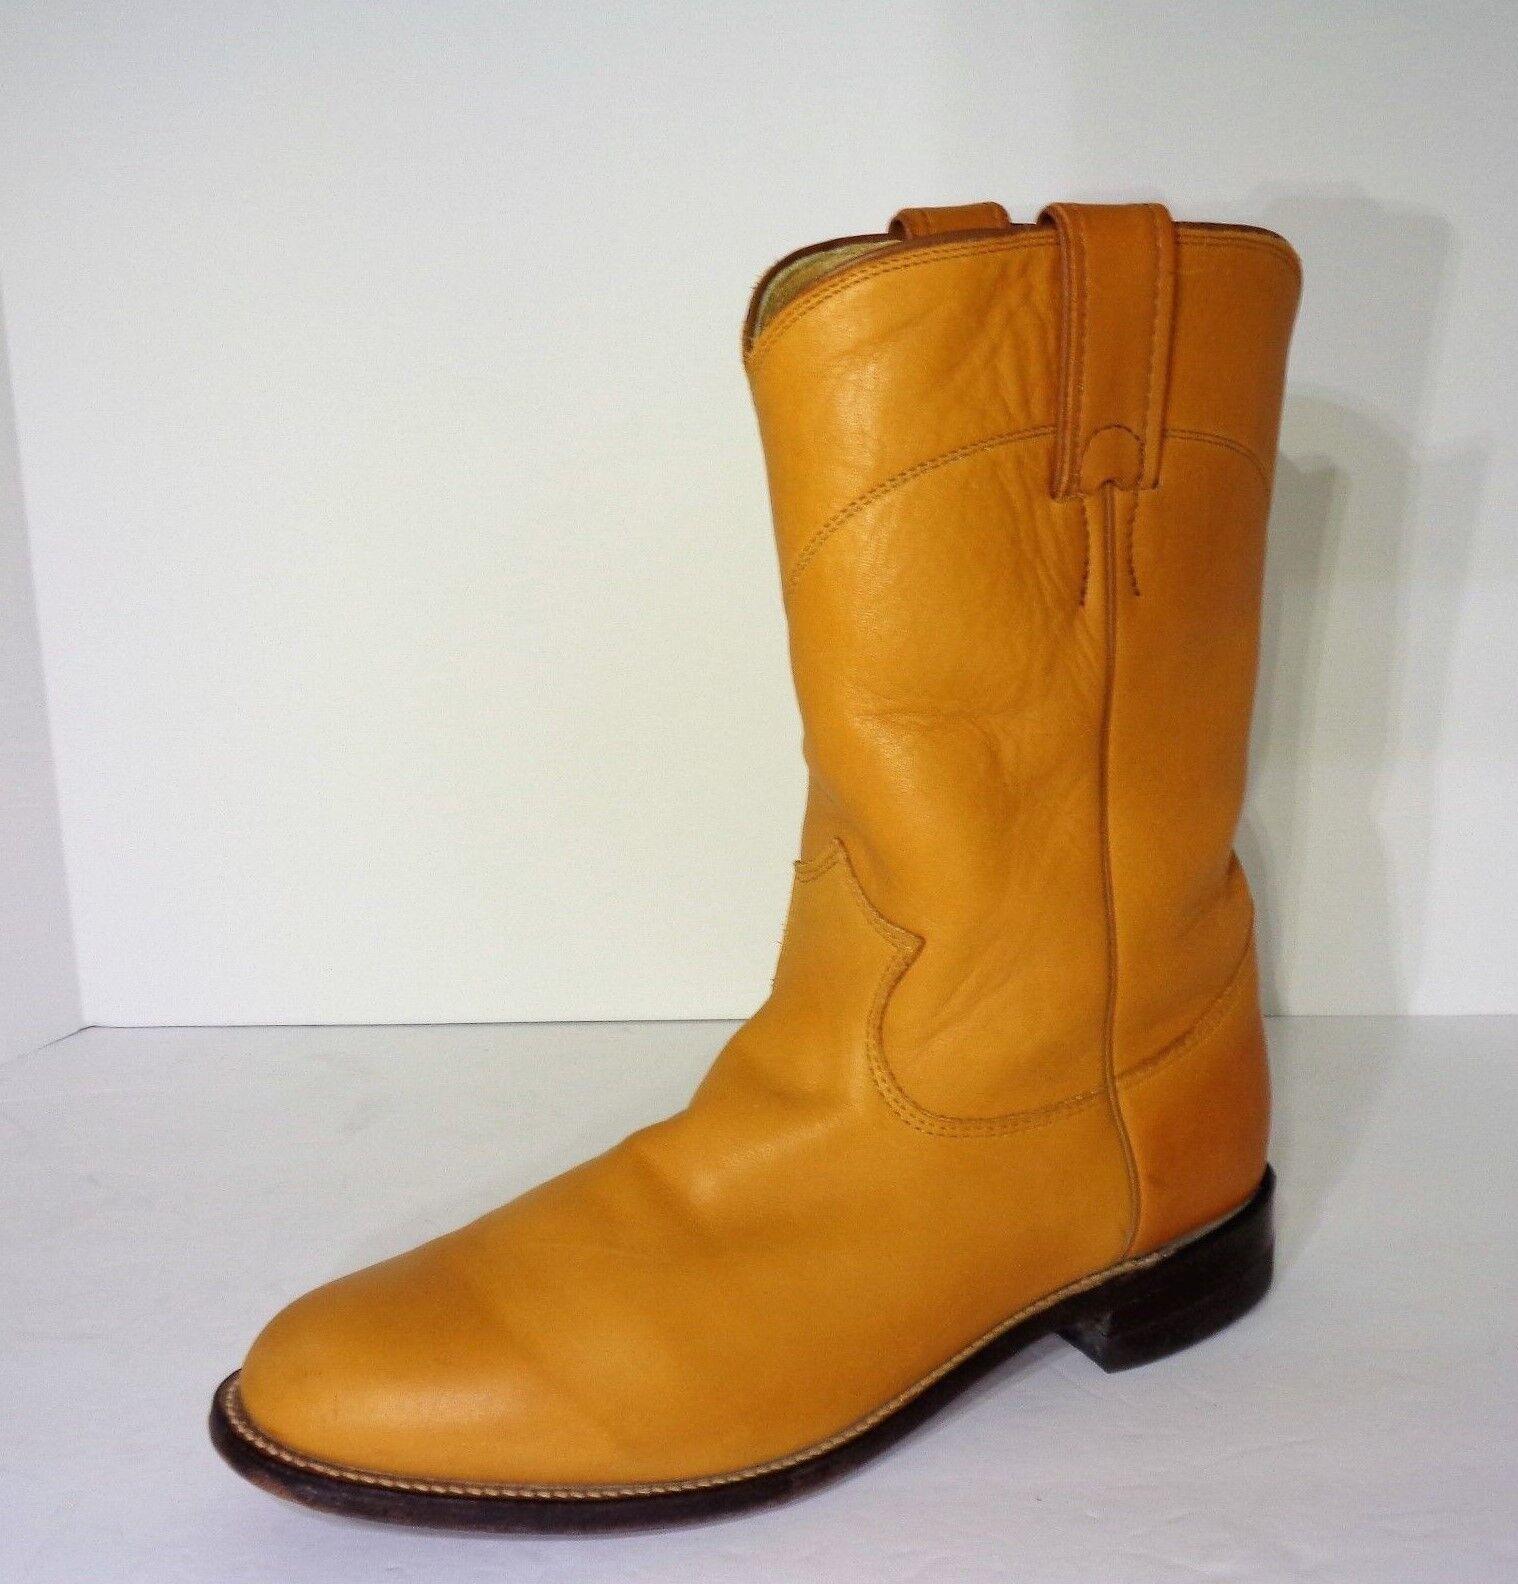 Rare  Mint  Vintage JUSTIN Ripe Mango Tan color Boots Womens Size 8 B USA